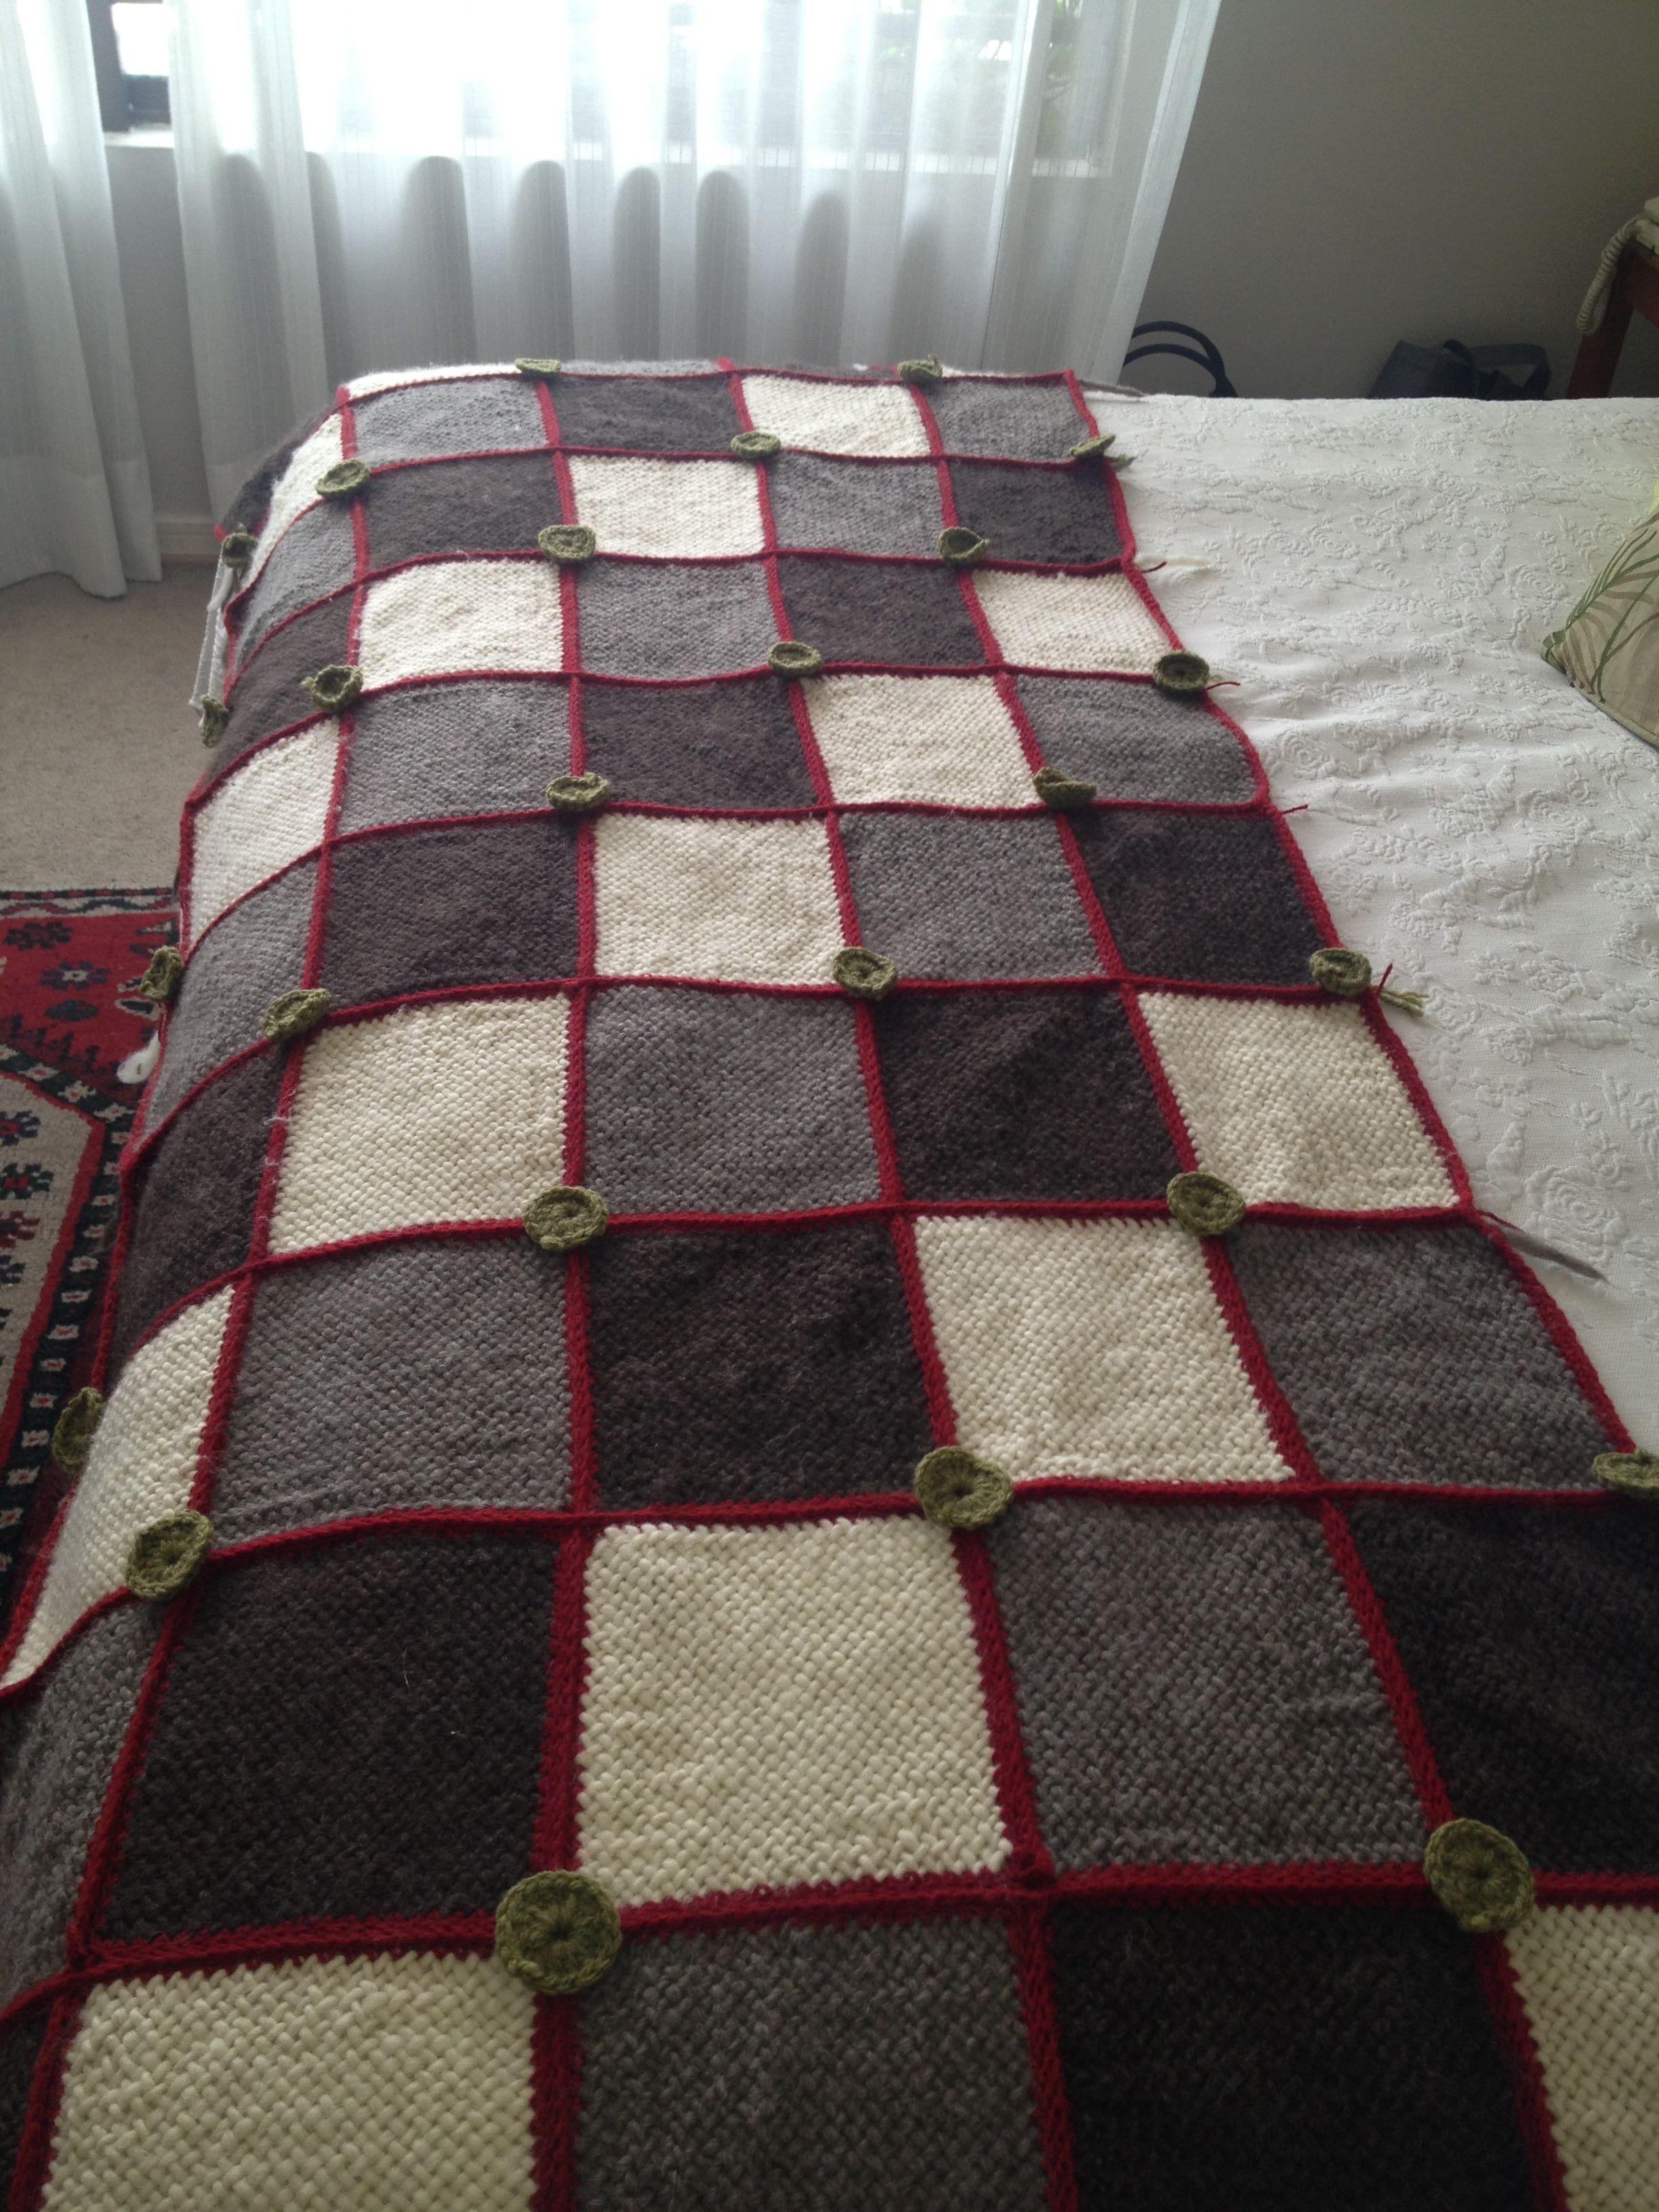 Piecera telar con detalles a crochet | Pieceras | Pinterest ...